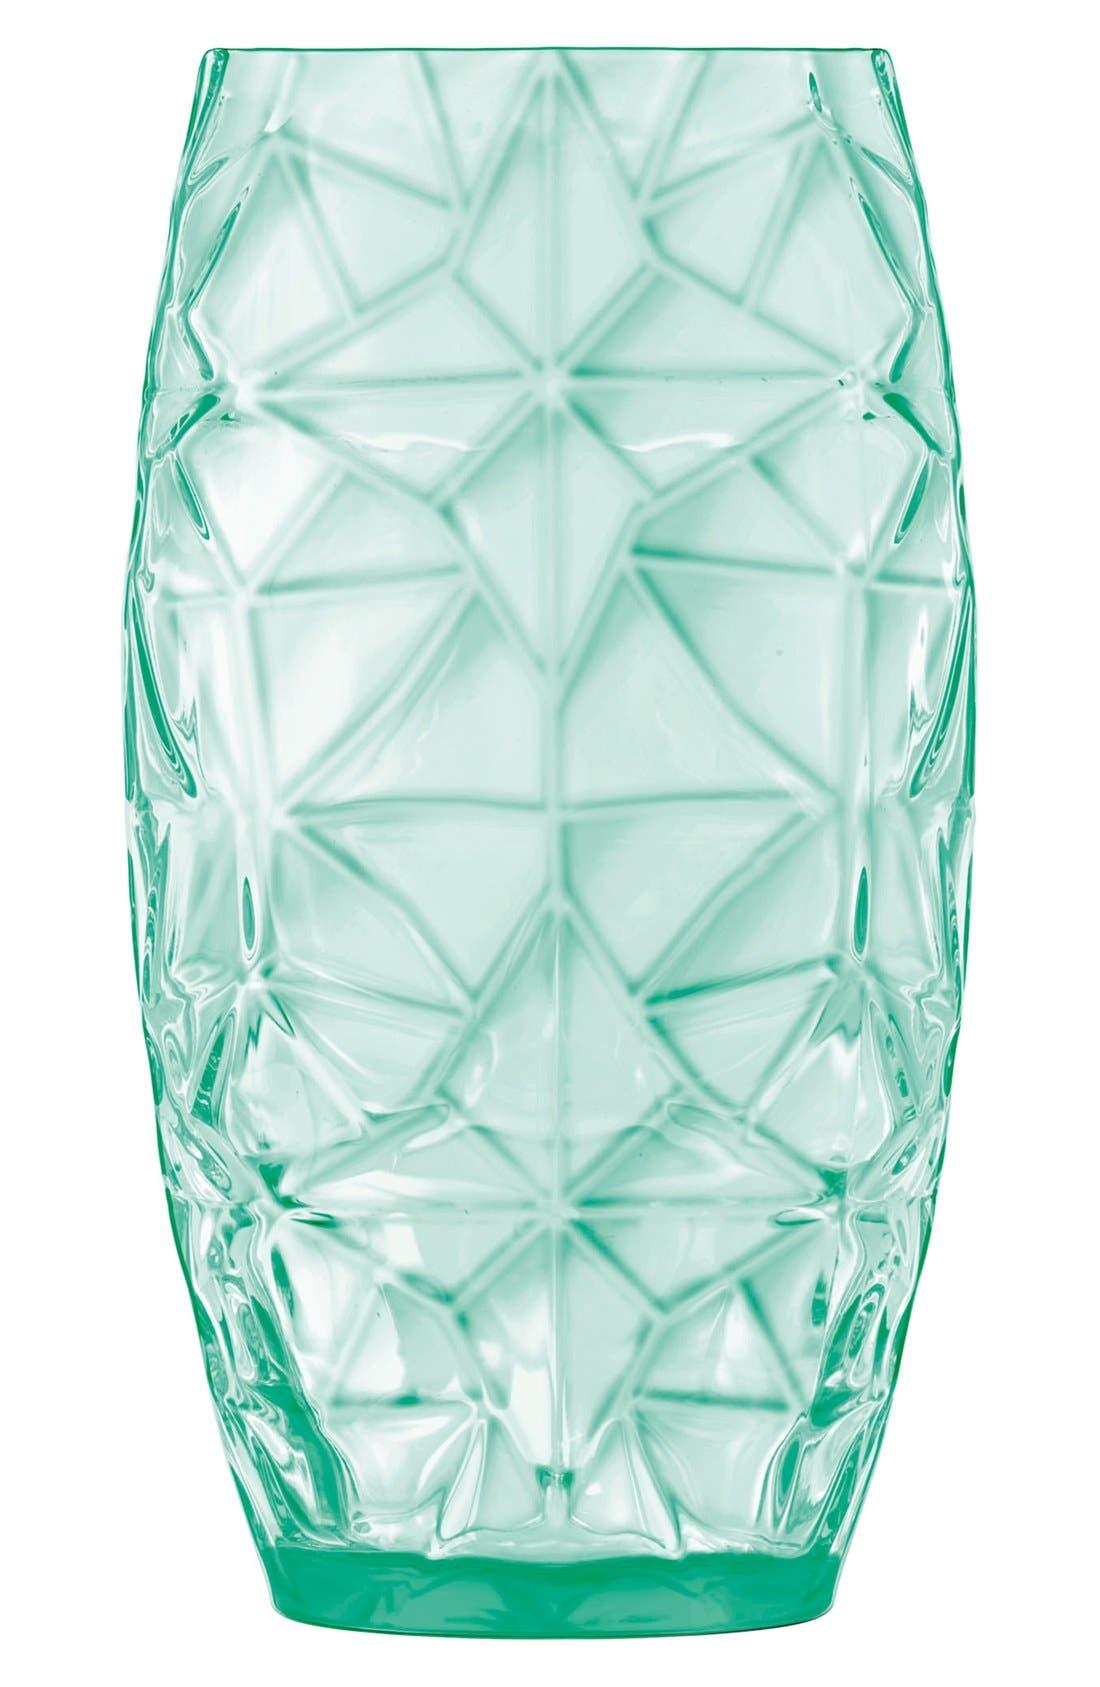 'Prezioso' Beverage Glasses,                             Main thumbnail 1, color,                             300